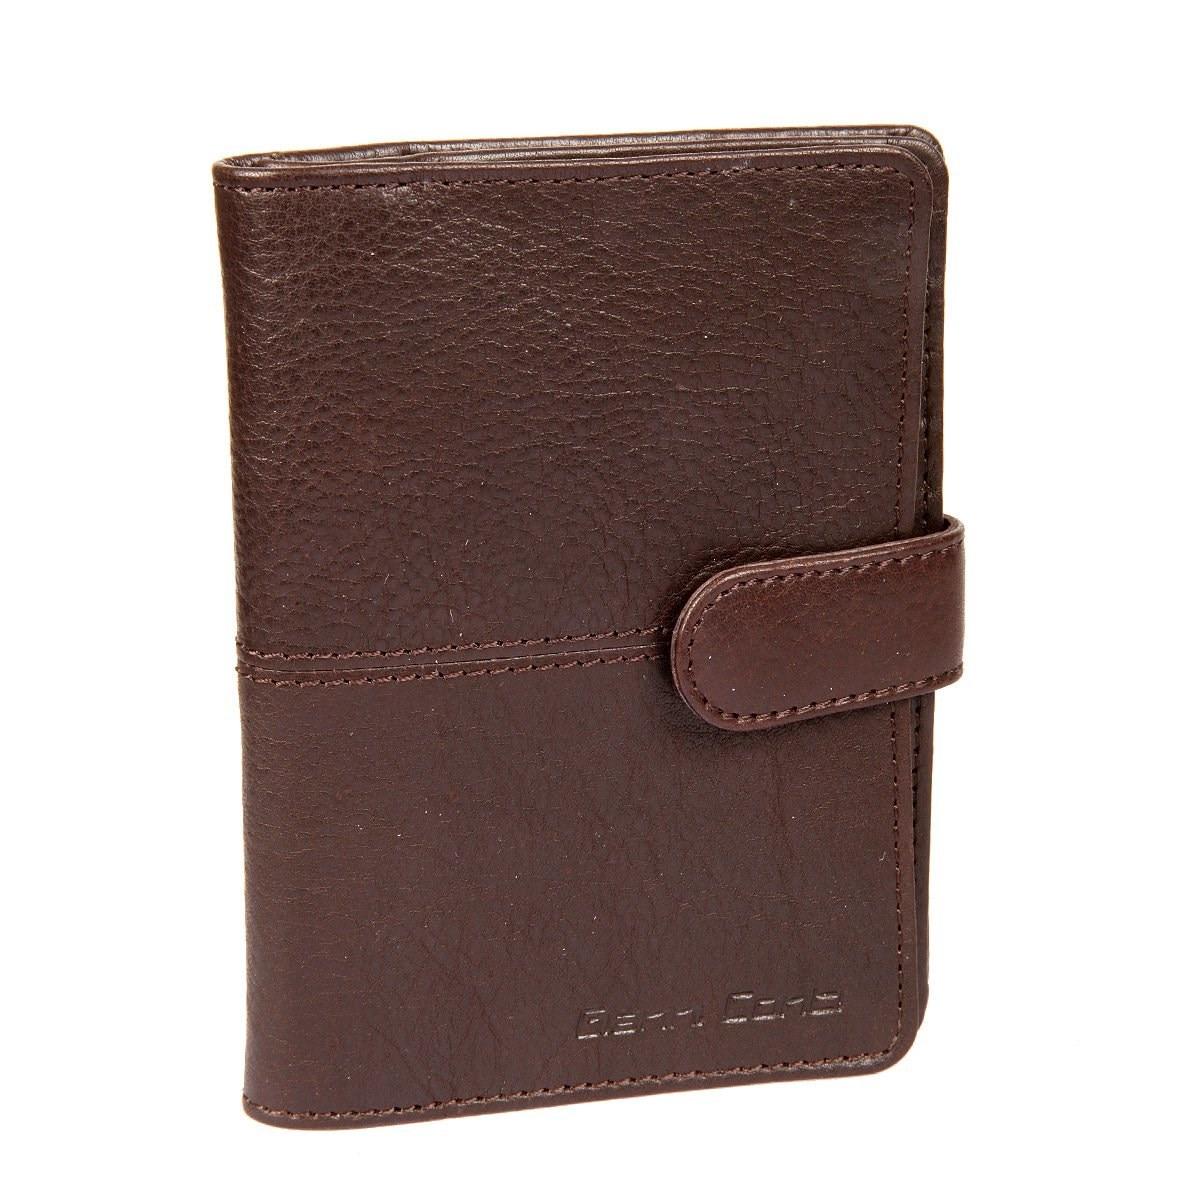 Passport cover and avtodokumentov Gianni Conti 1137458 dark brown